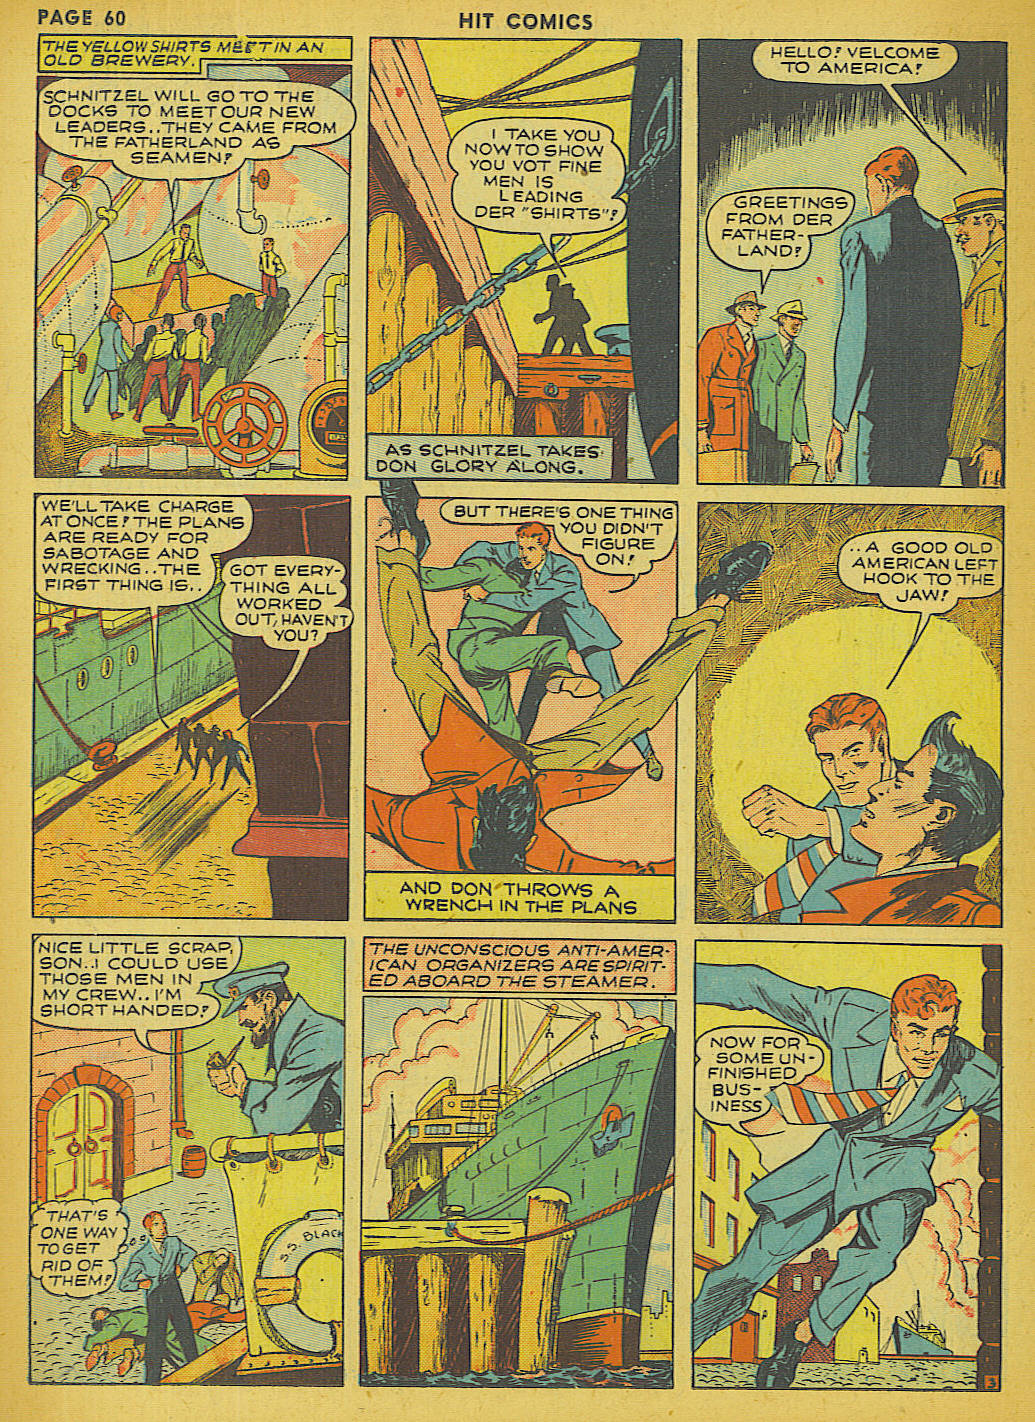 Read online Hit Comics comic -  Issue #13 - 62